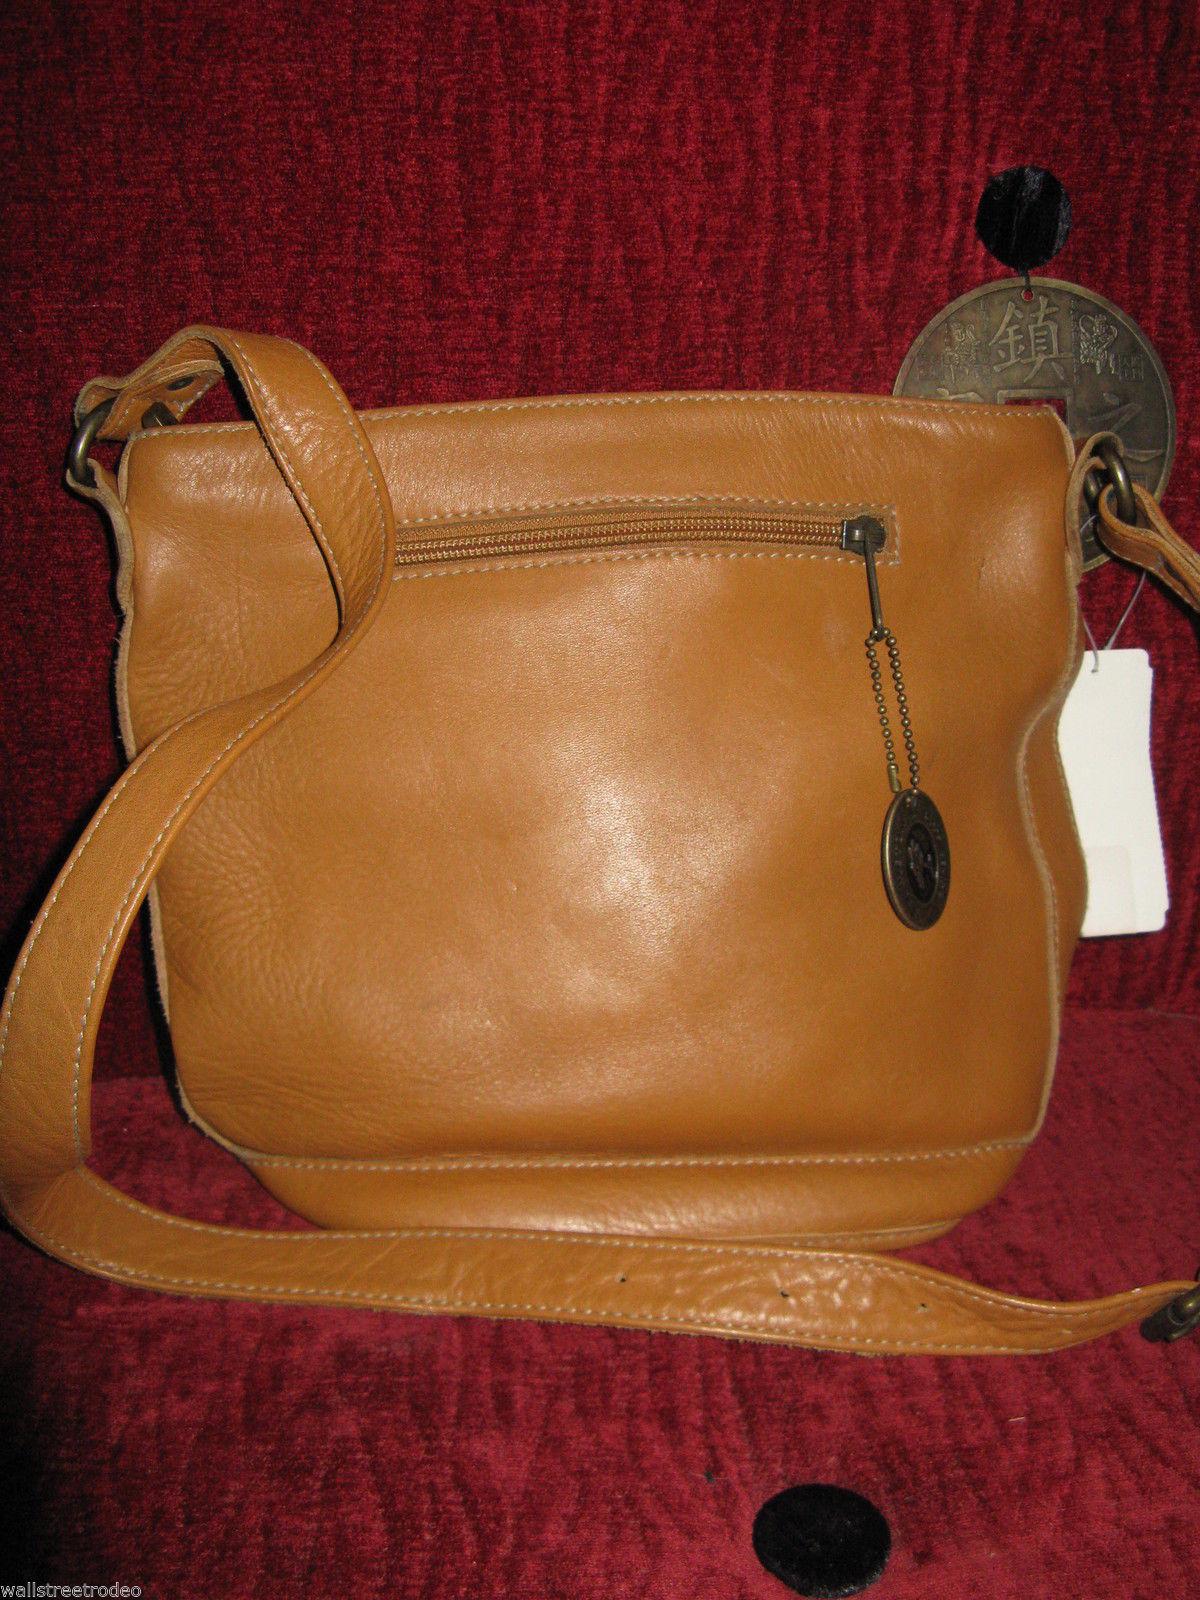 Ellington Portland  leather bucket bag tote handbag purse